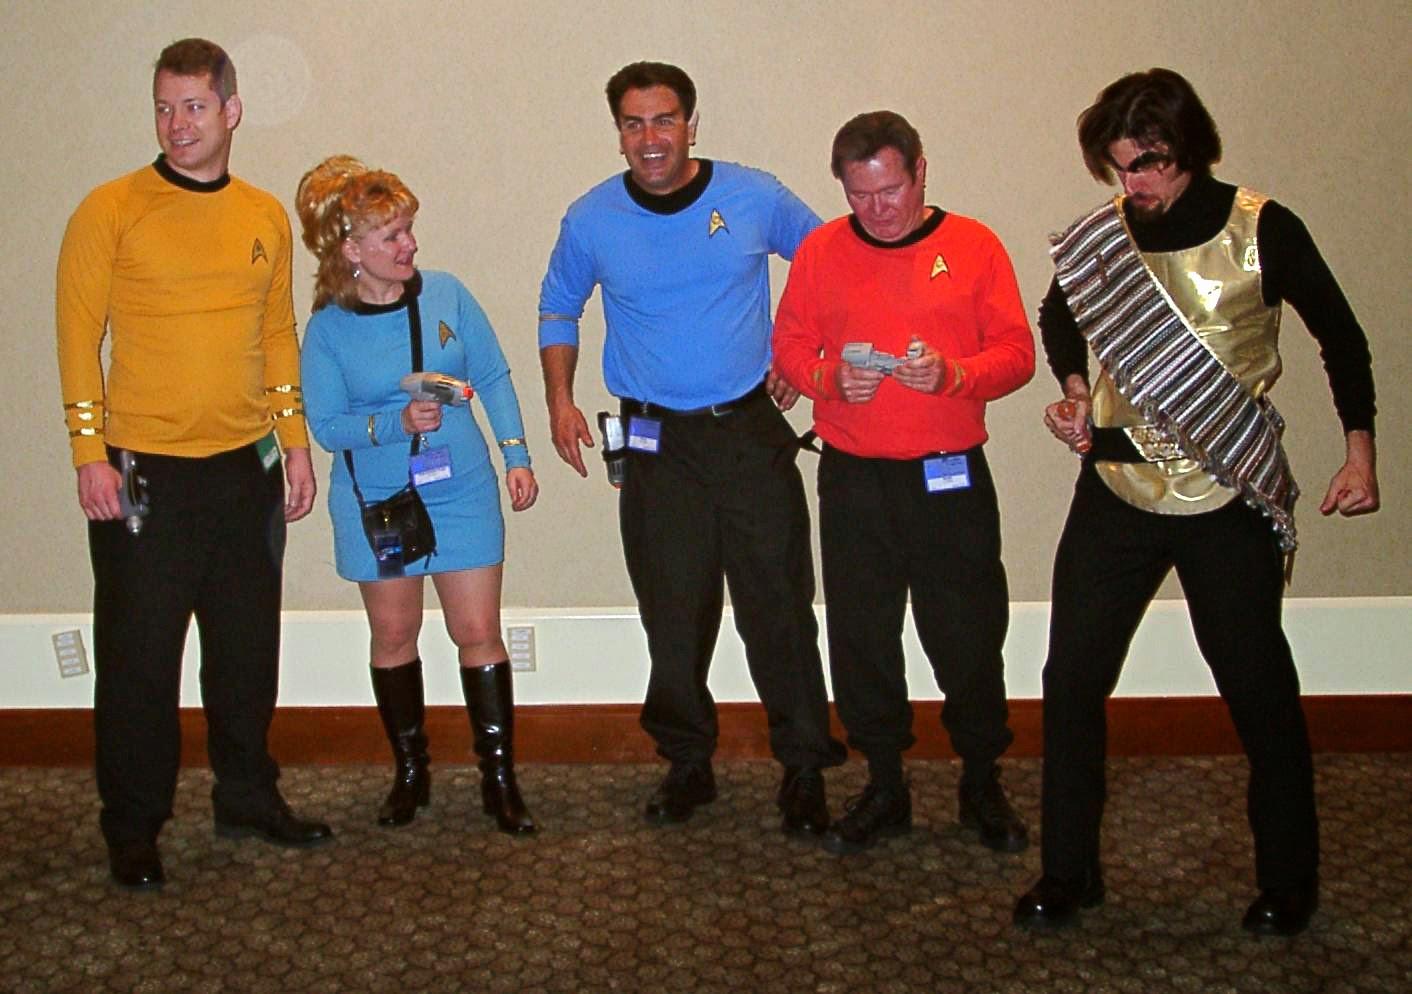 star trek convention trekkies trekkers nerd geek fanboys red shirt klingon jj abrams paramount